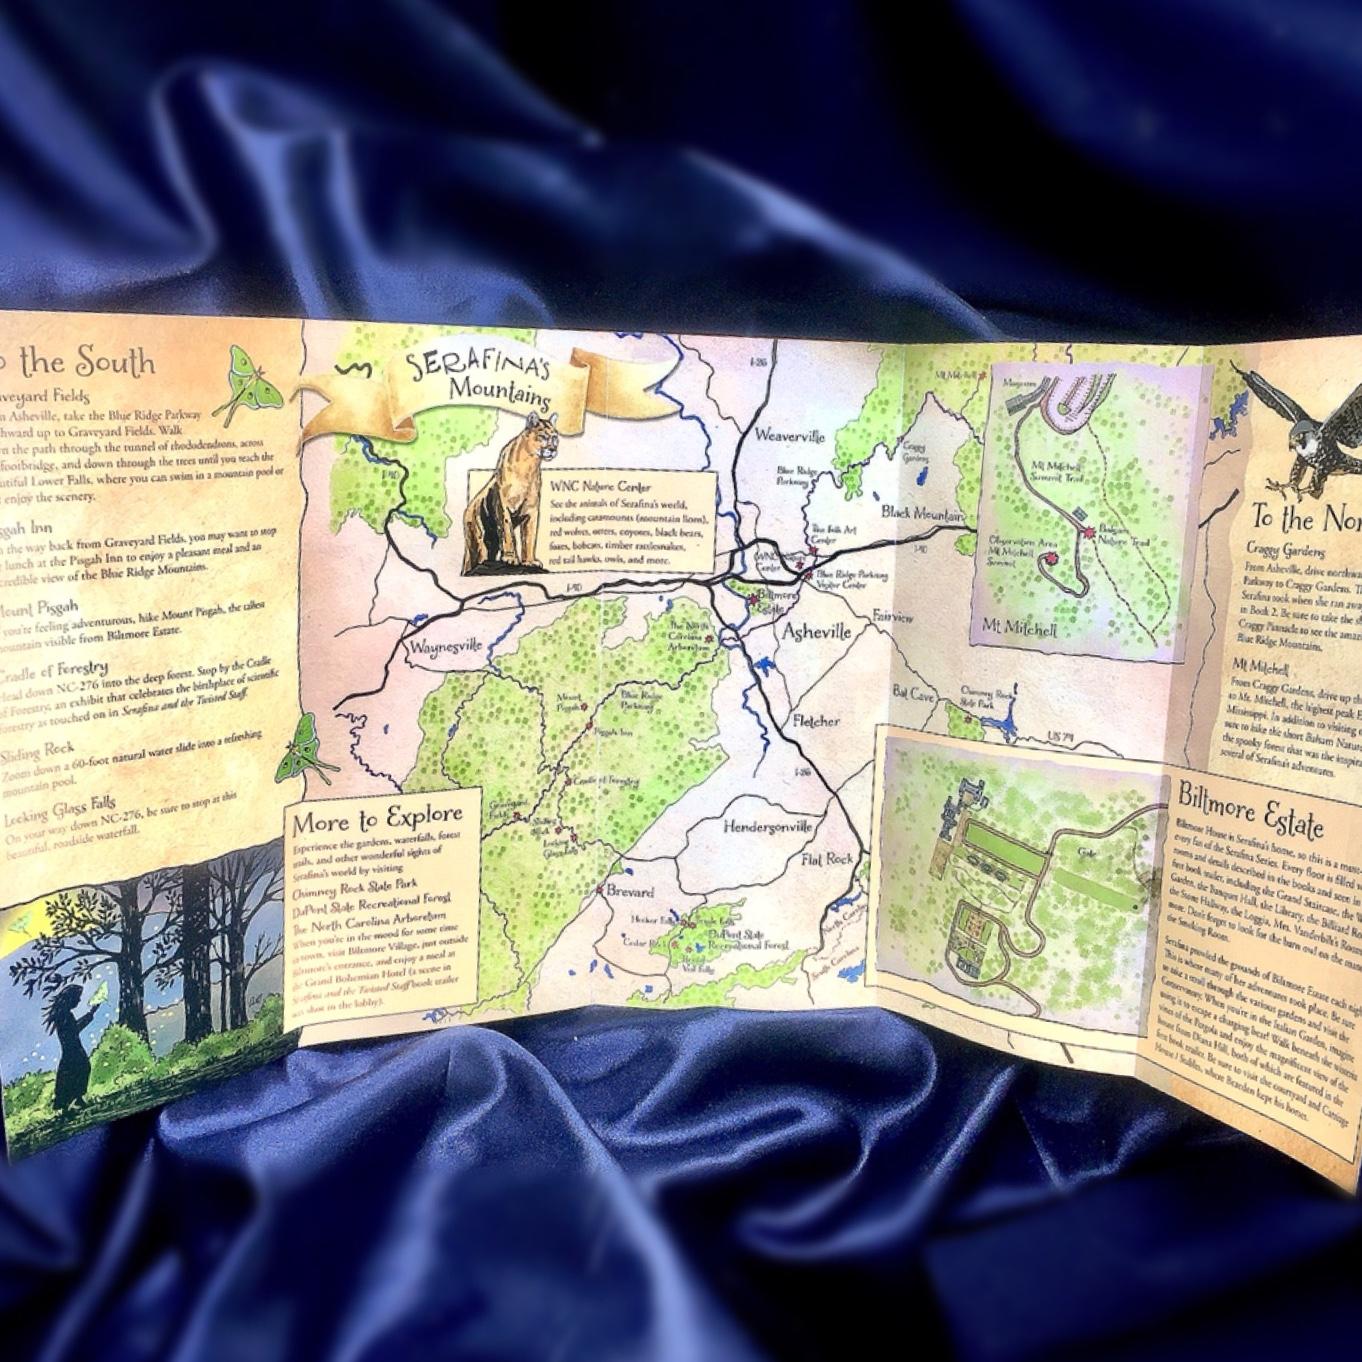 adventure-map-of-serafina-and-willas-mountains-robert-beatty-middle-grade-disney-hyperion